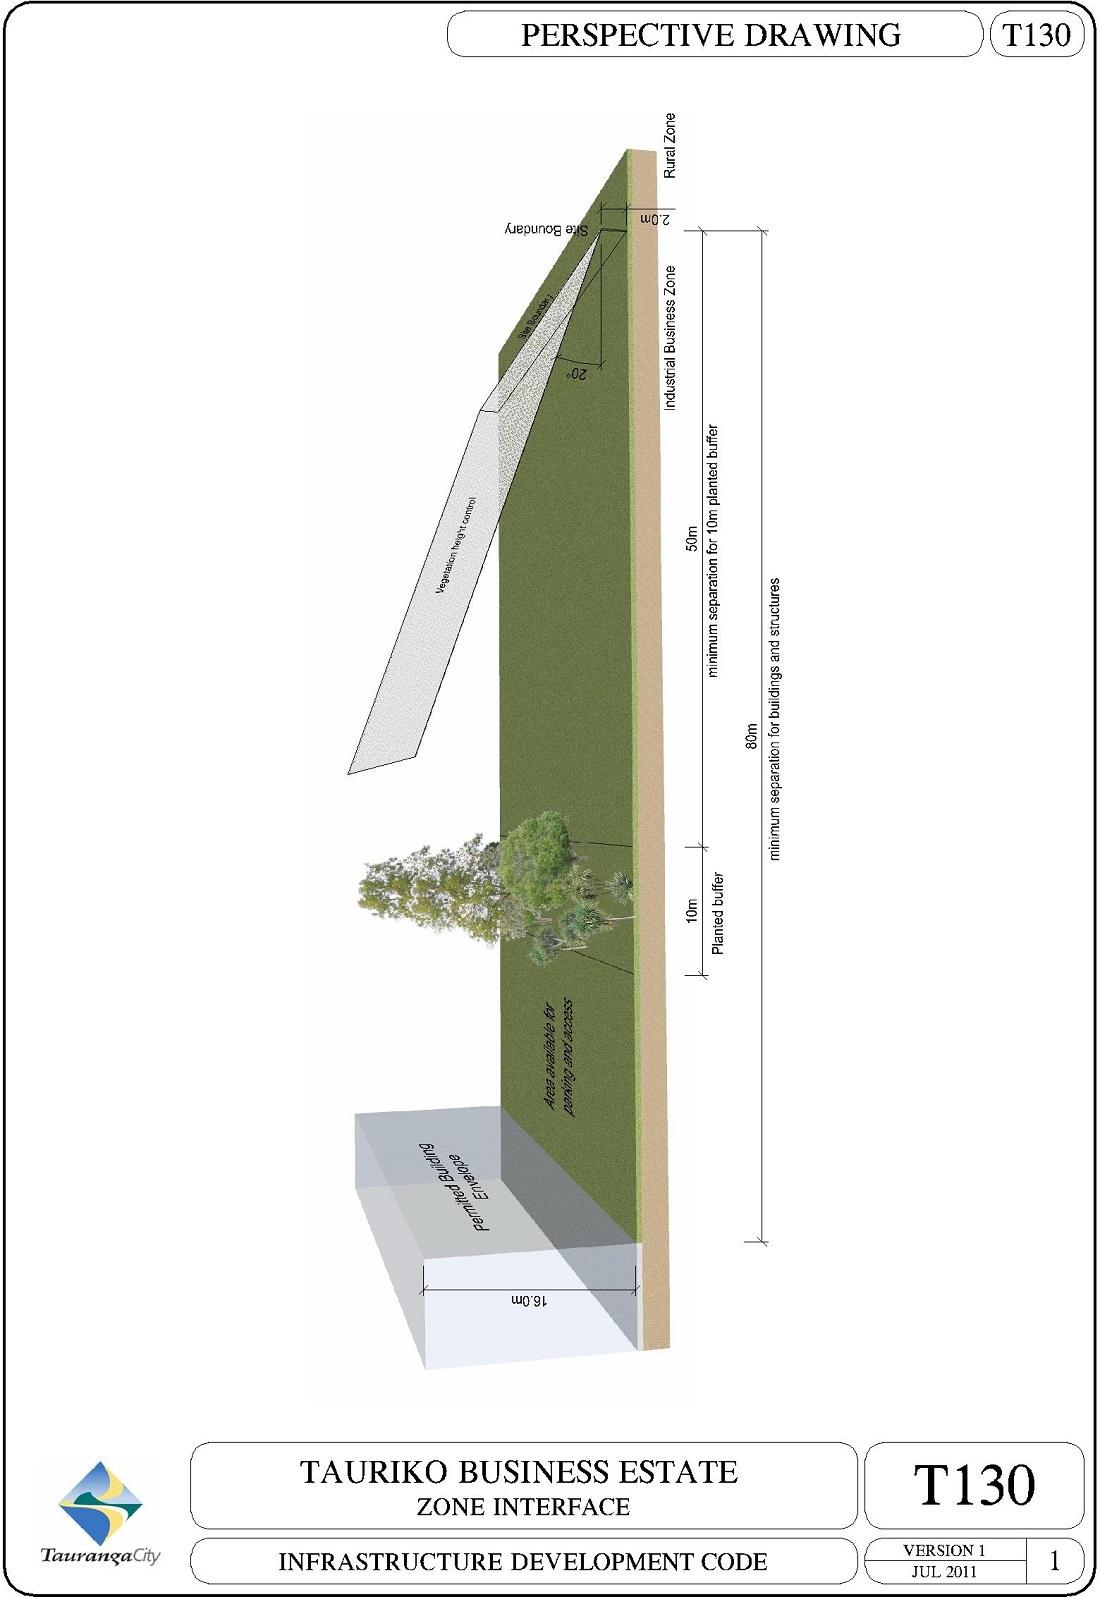 Tauriko Business Estate - Zone Interface